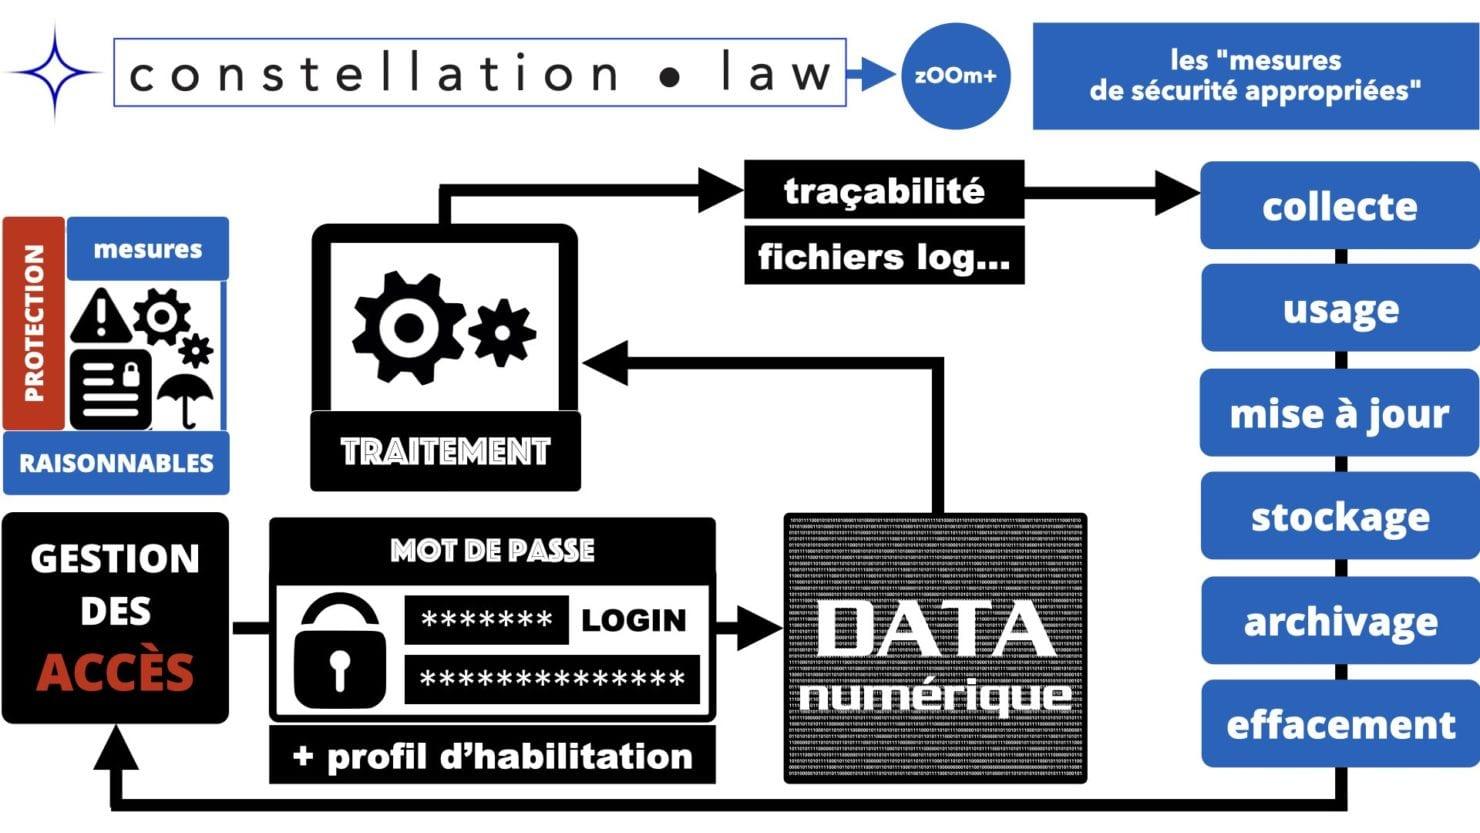 RGPD e-Privacy principes actualité jurisprudence ©Ledieu-Avocats 25-06-2021.275